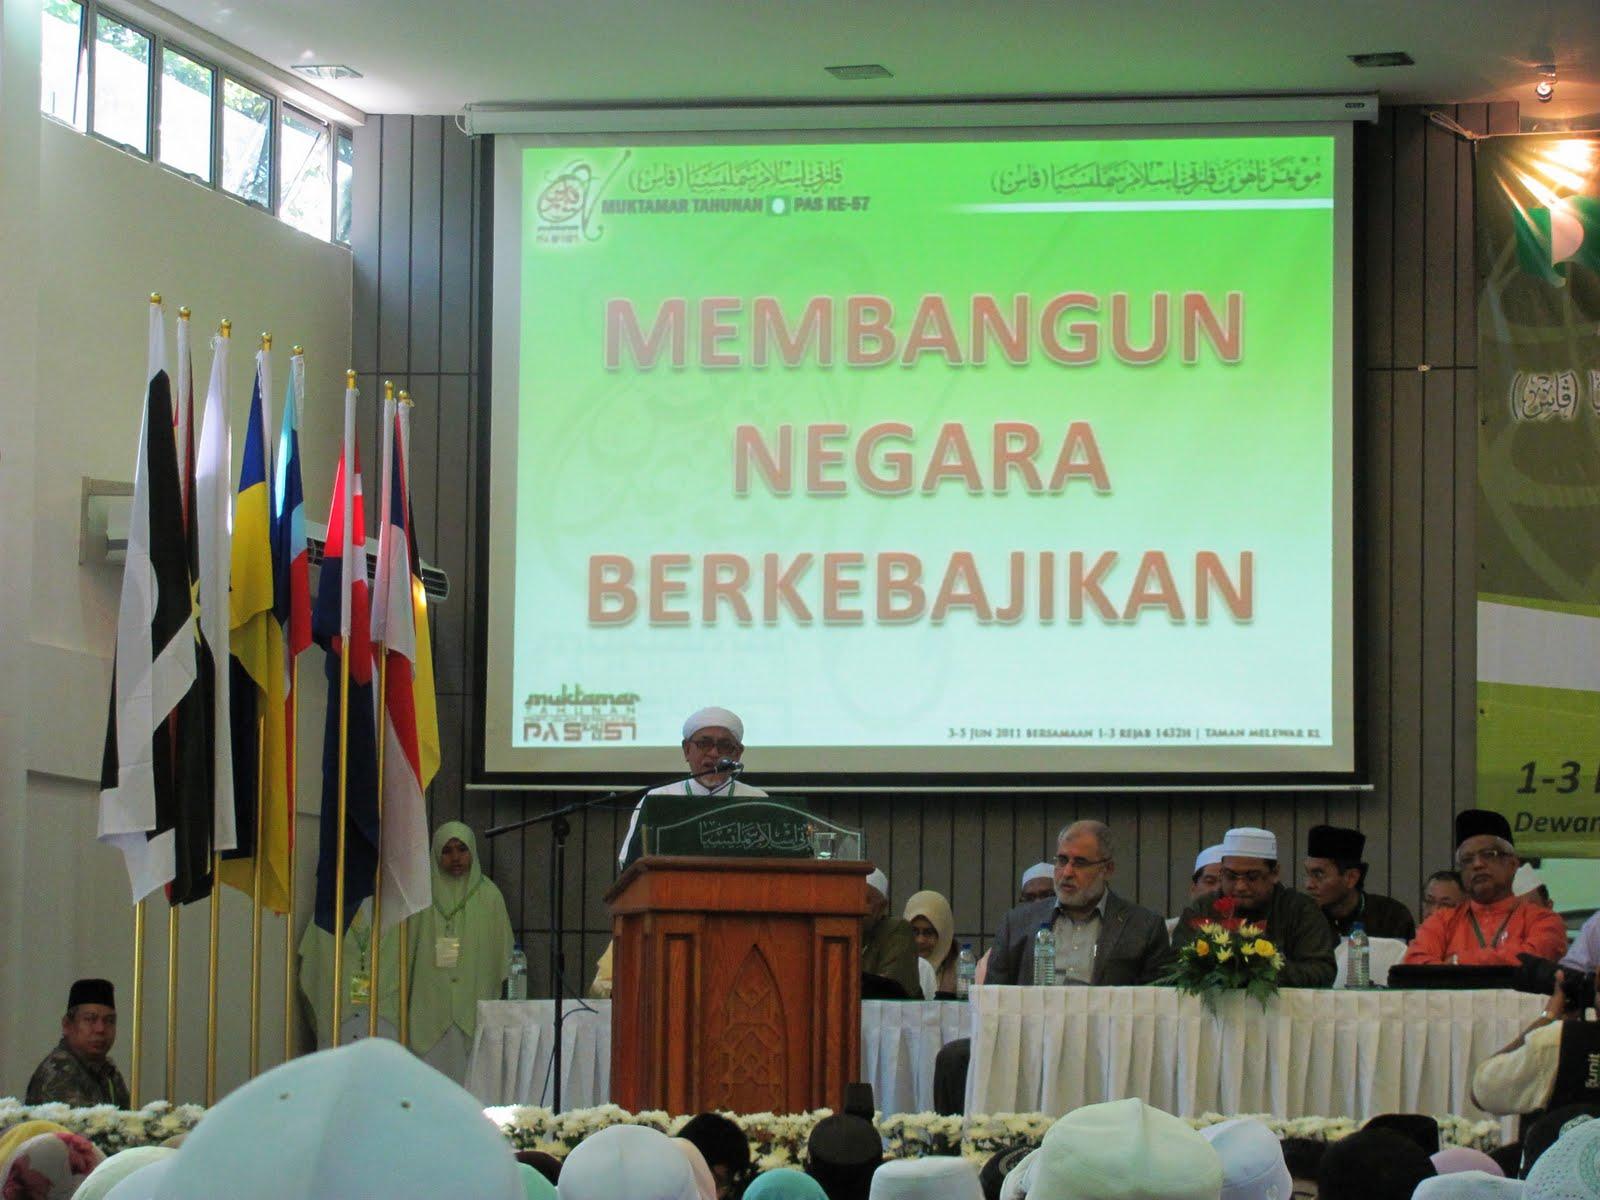 http://www.niknasri.com/wp-content/uploads/2011/07/Membangun-Negara-Berkebajikan.JPG